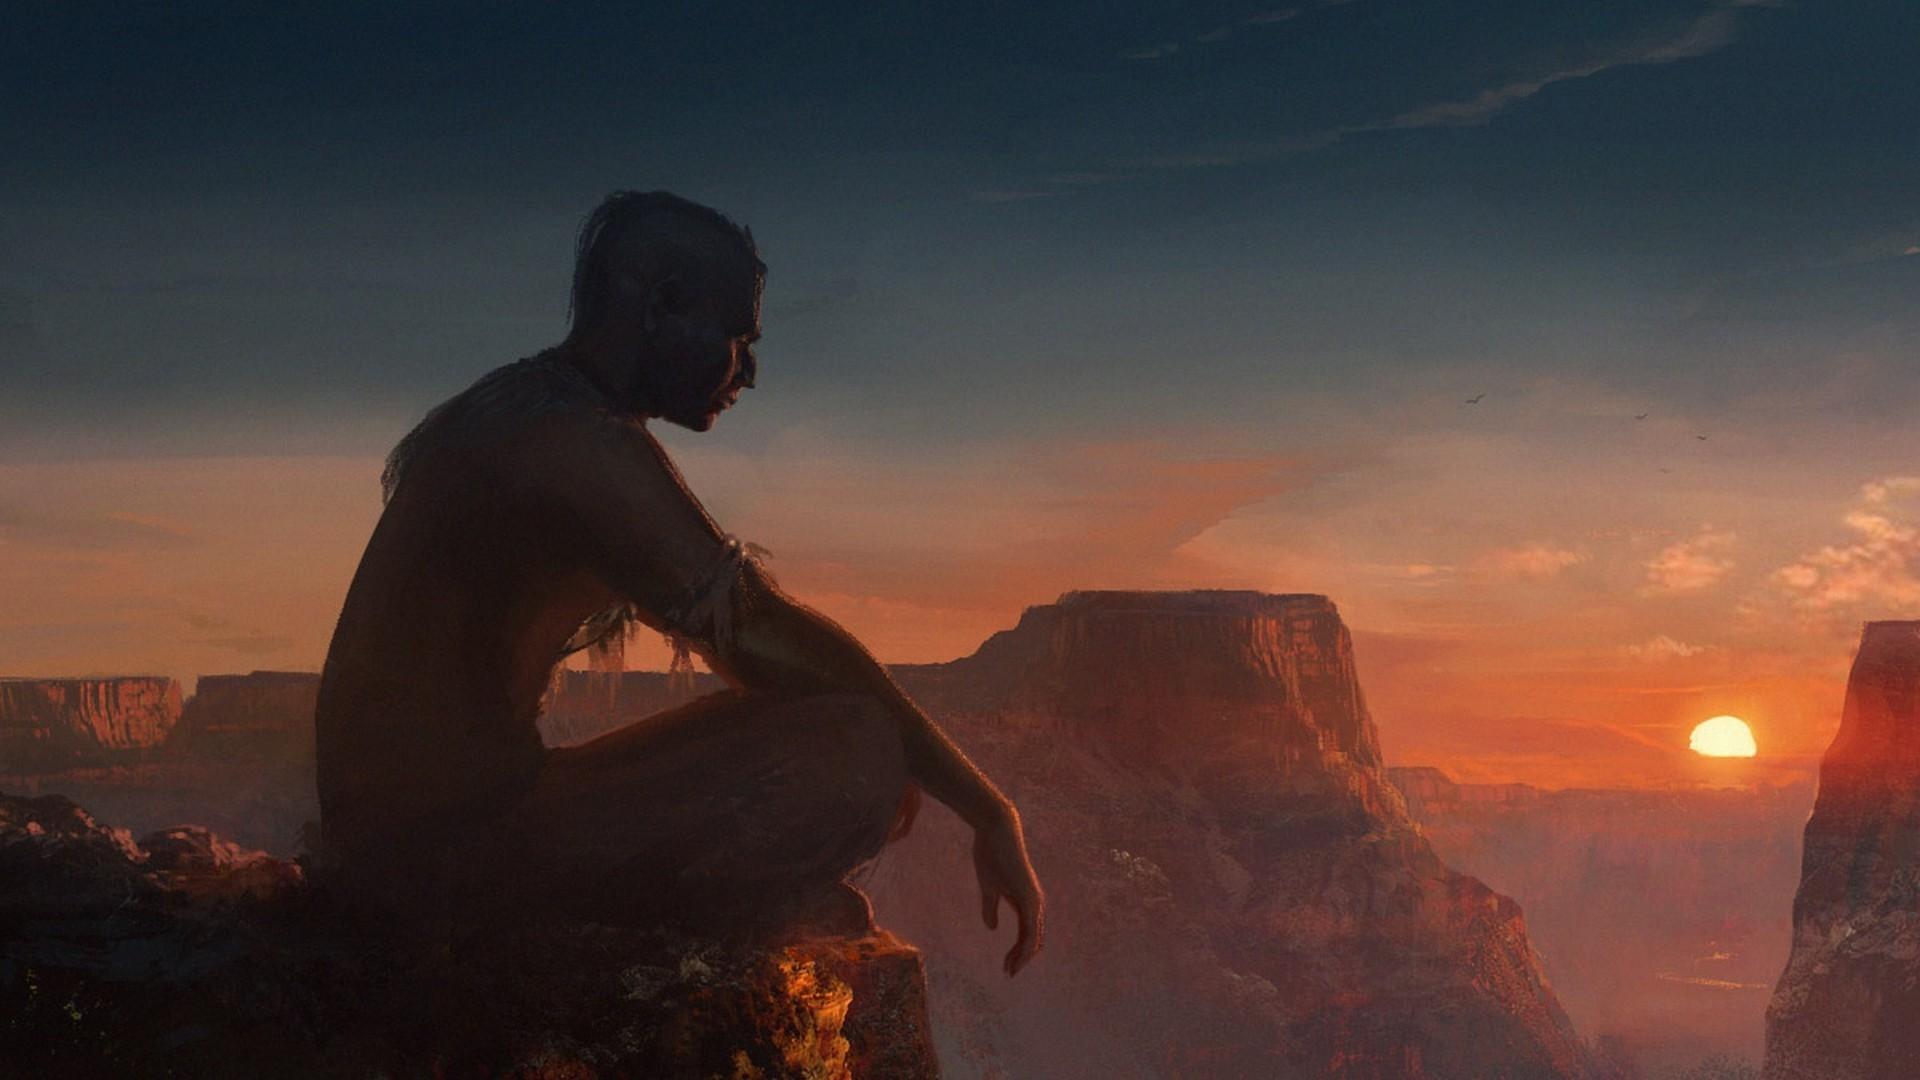 meditation, Spiritual, Shaman, Sunset, Aboriginal, Native Americans  Wallpapers HD / Desktop and Mobile Backgrounds